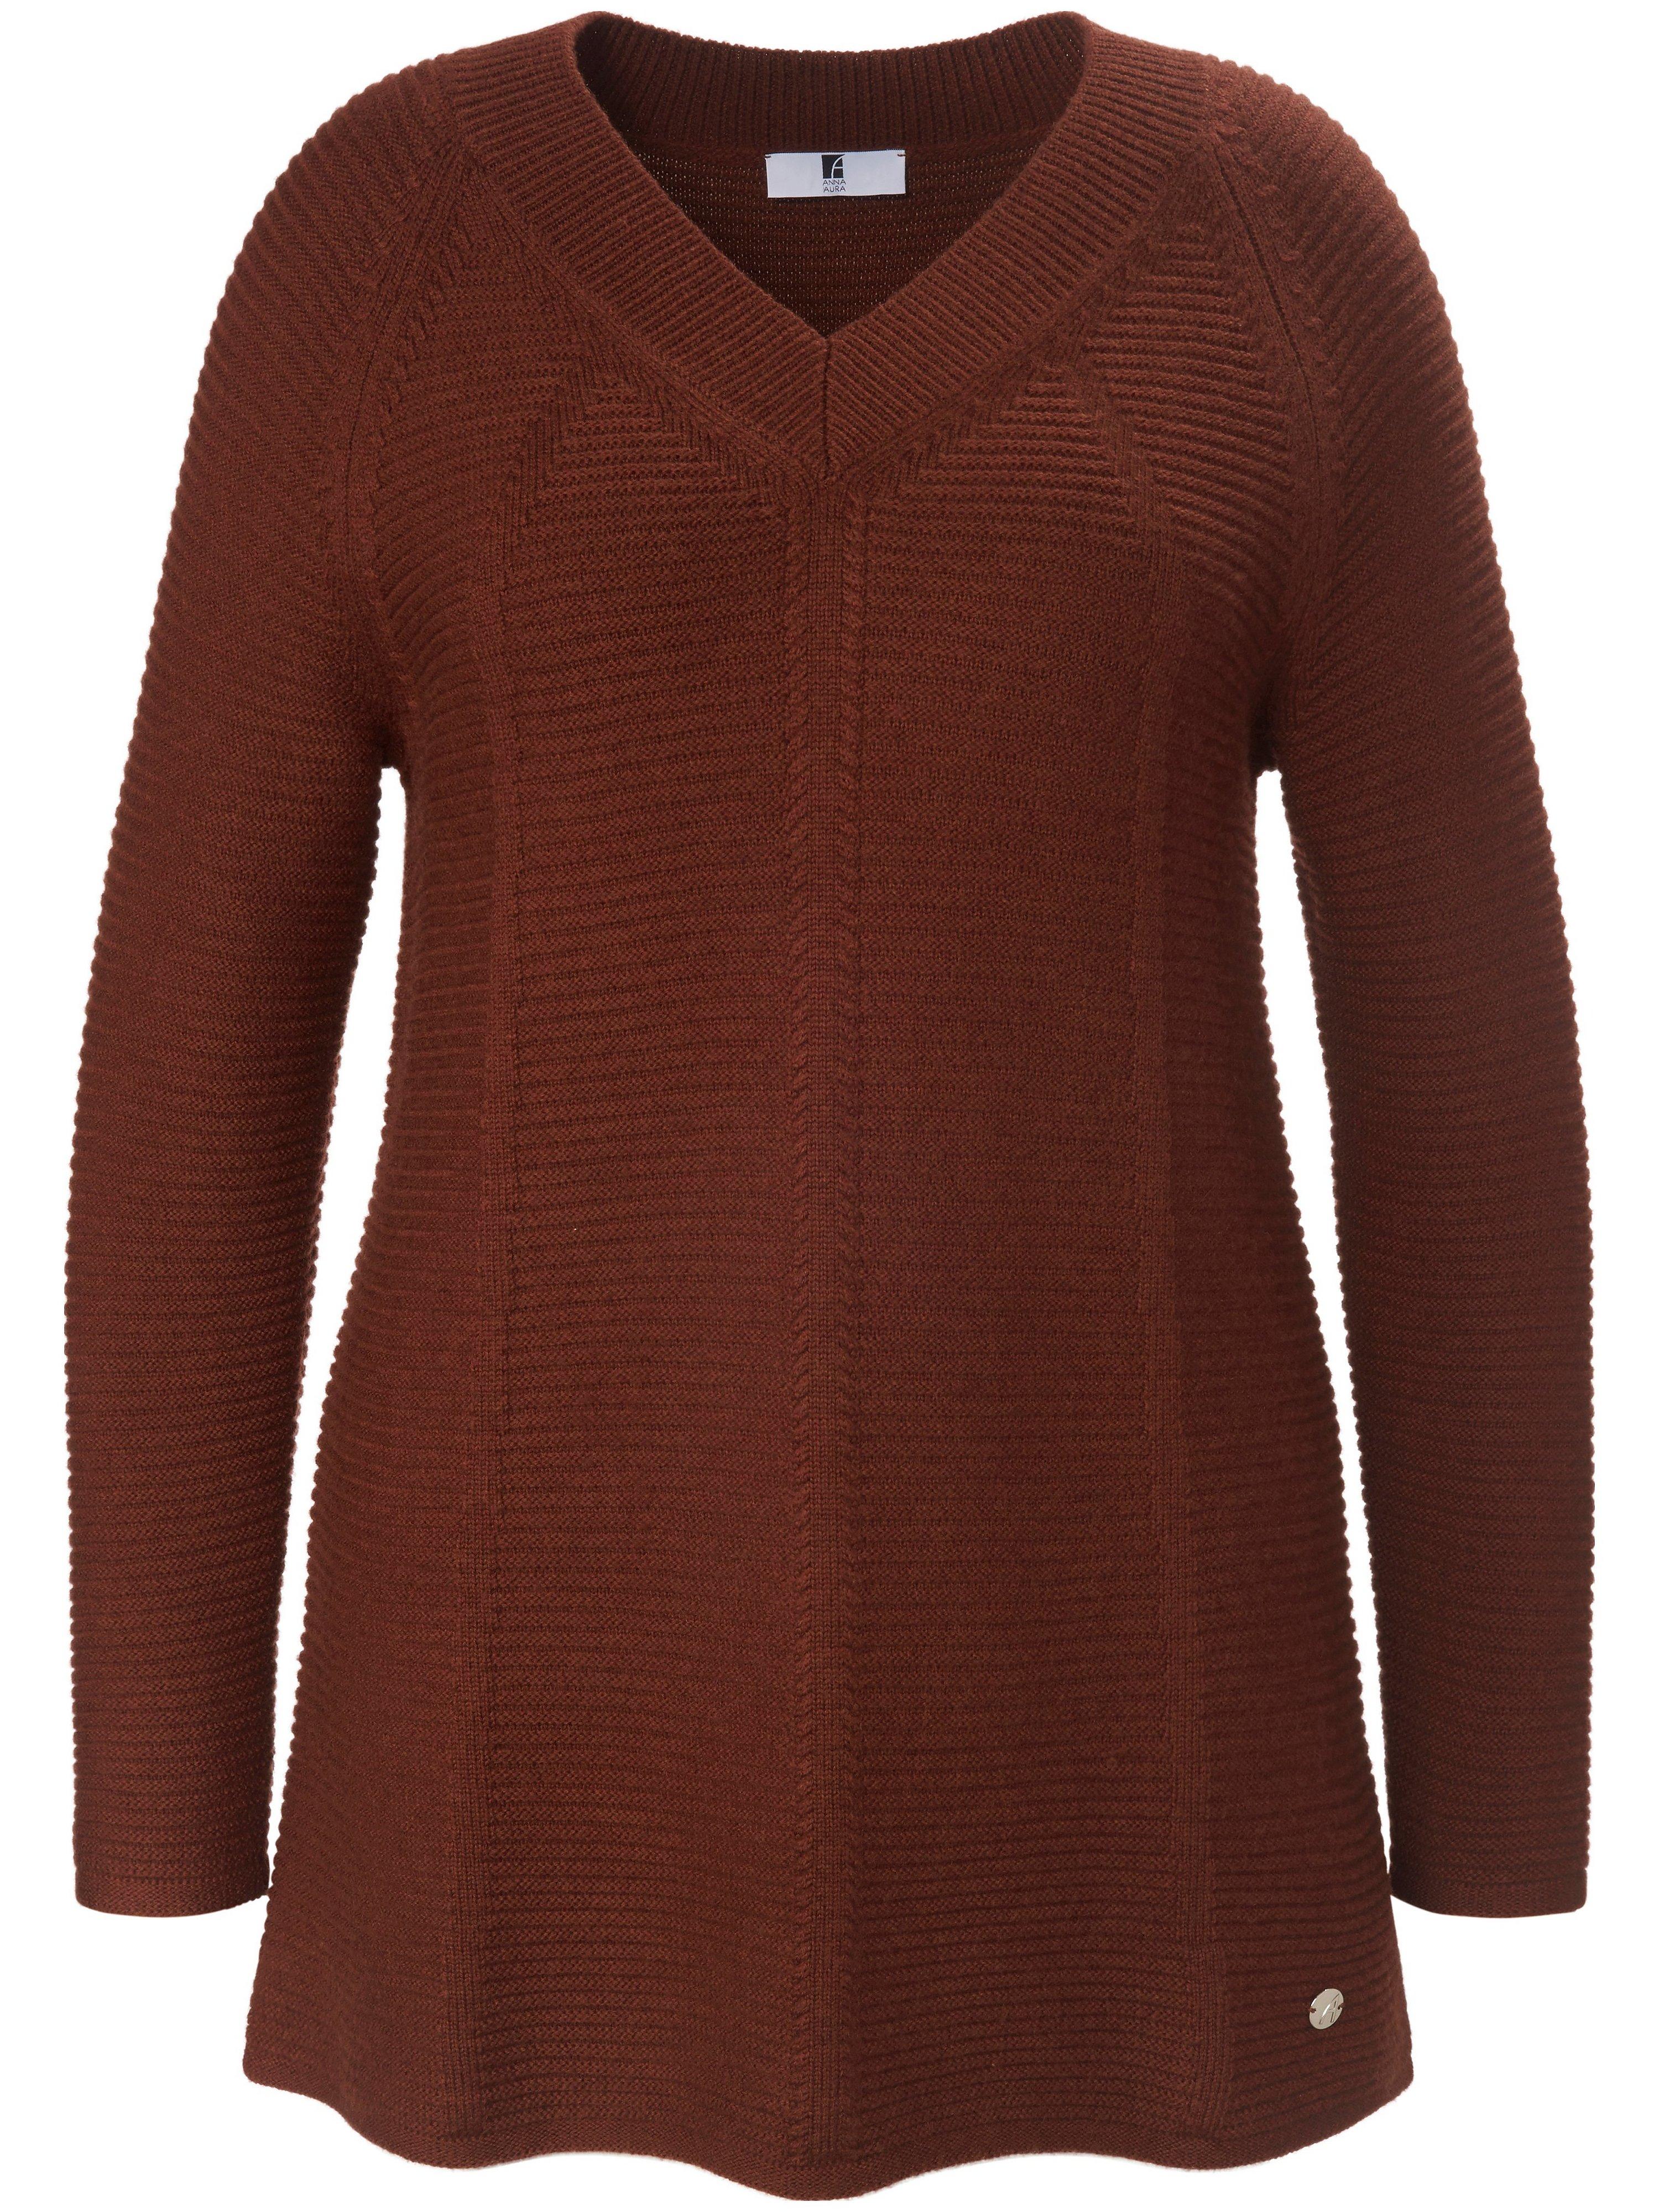 Le pull 100% laine vierge  Anna Aura marron taille 54